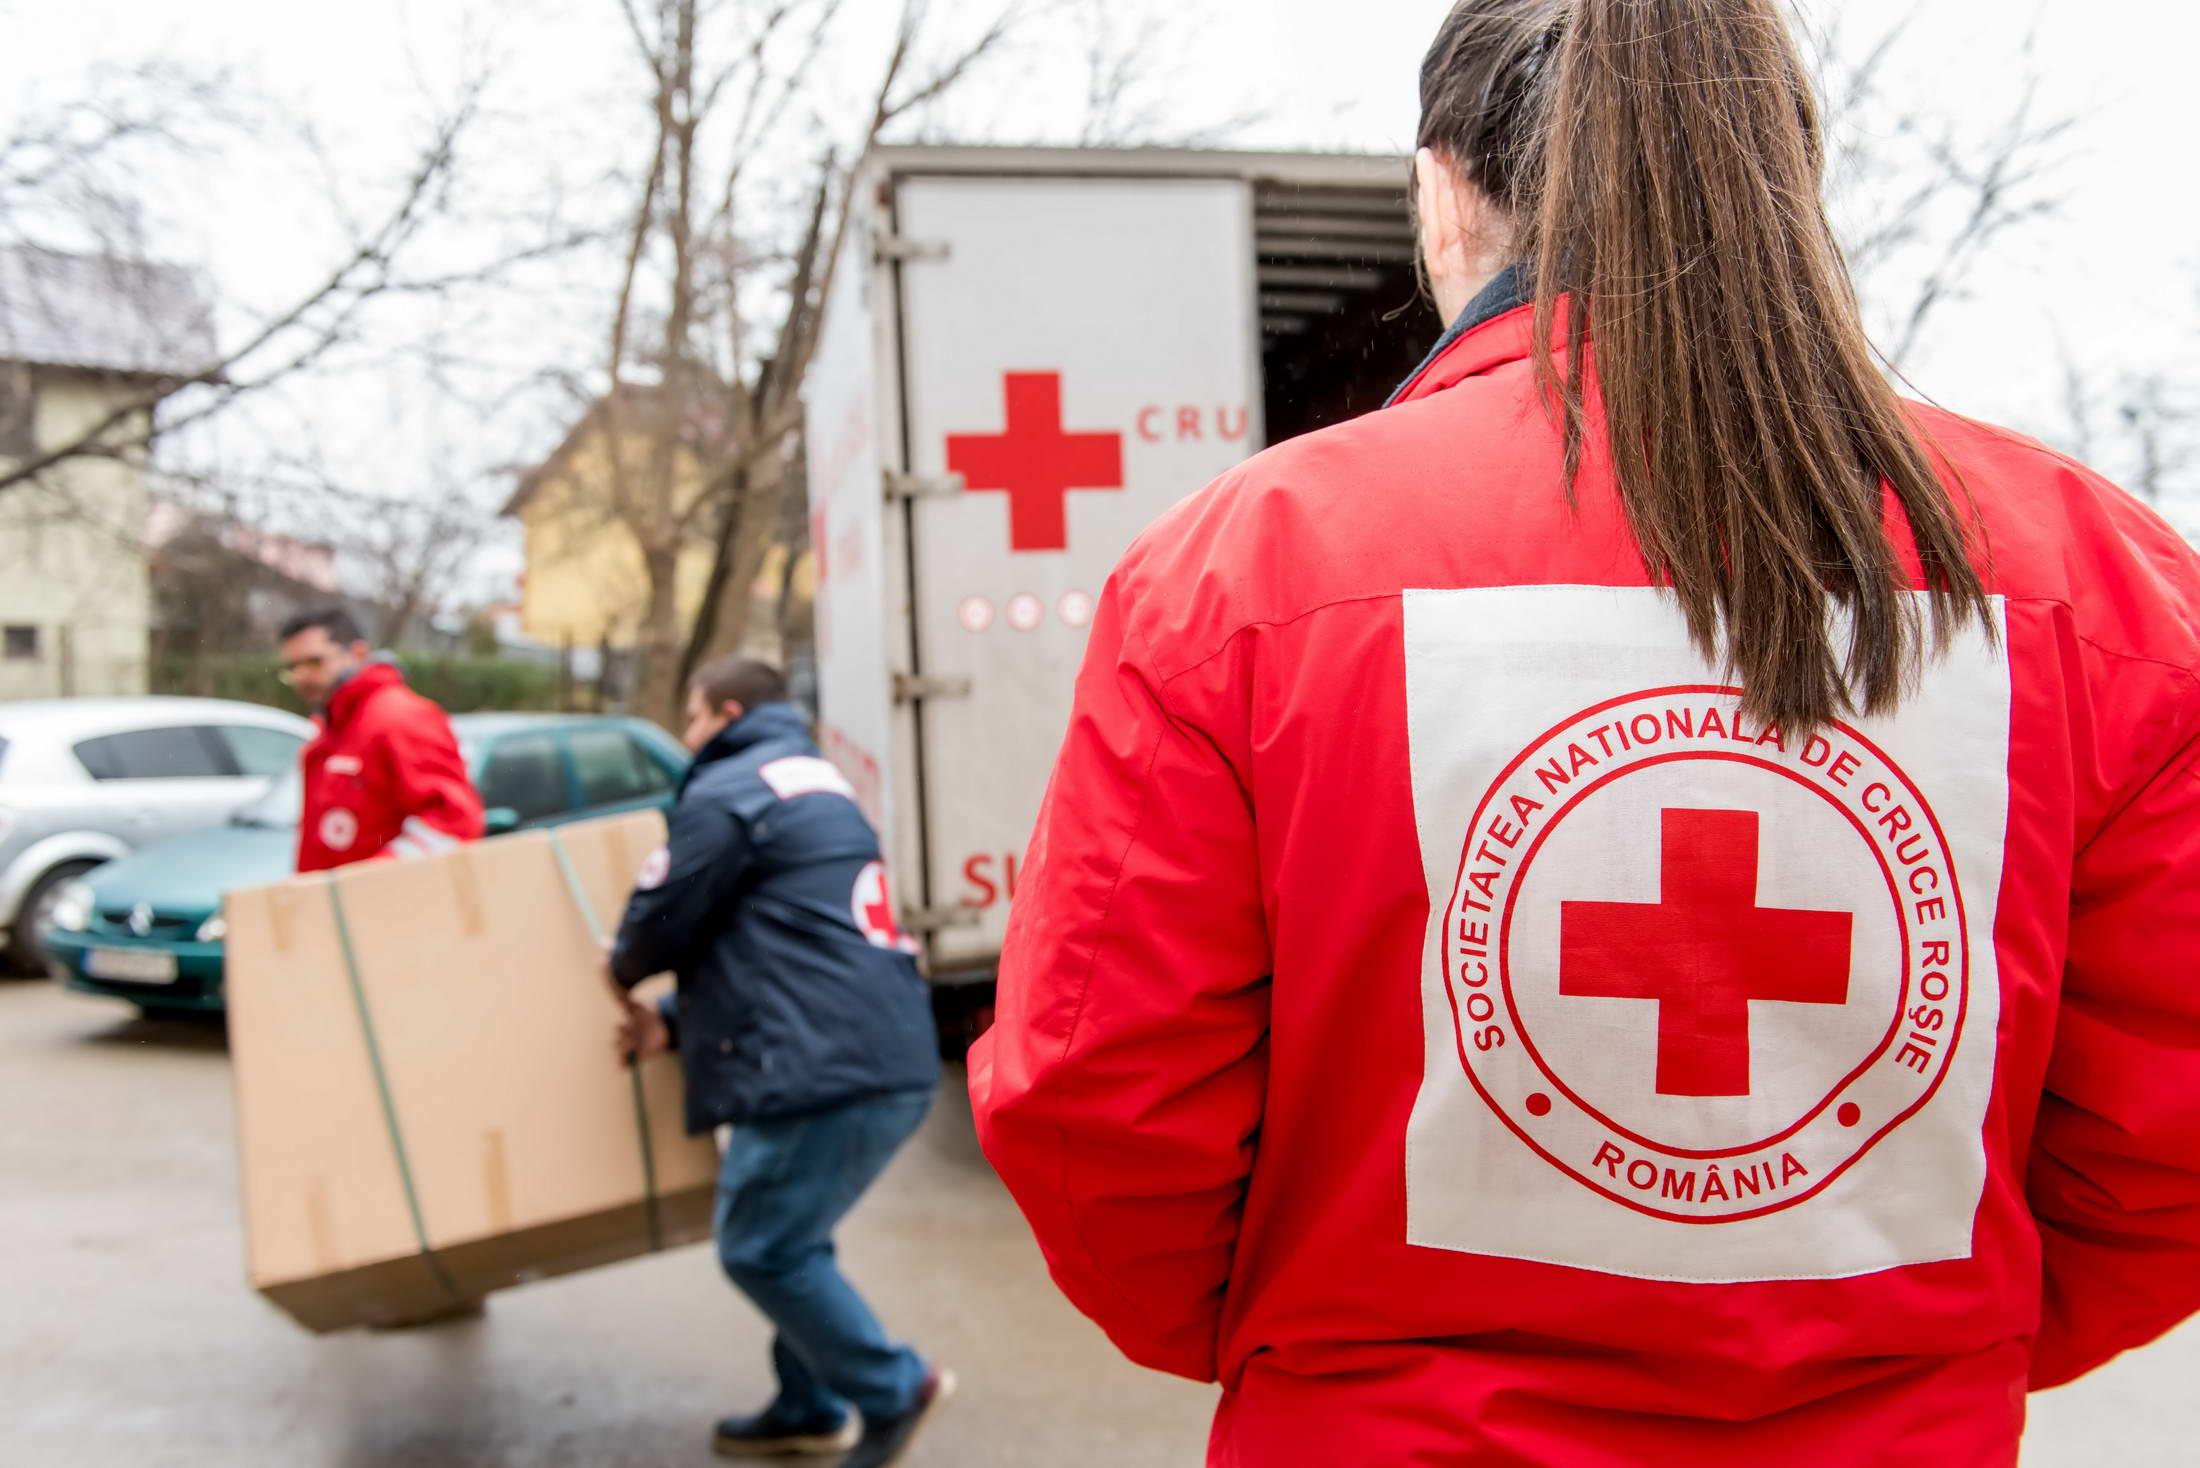 Donatie Crucea Rosie